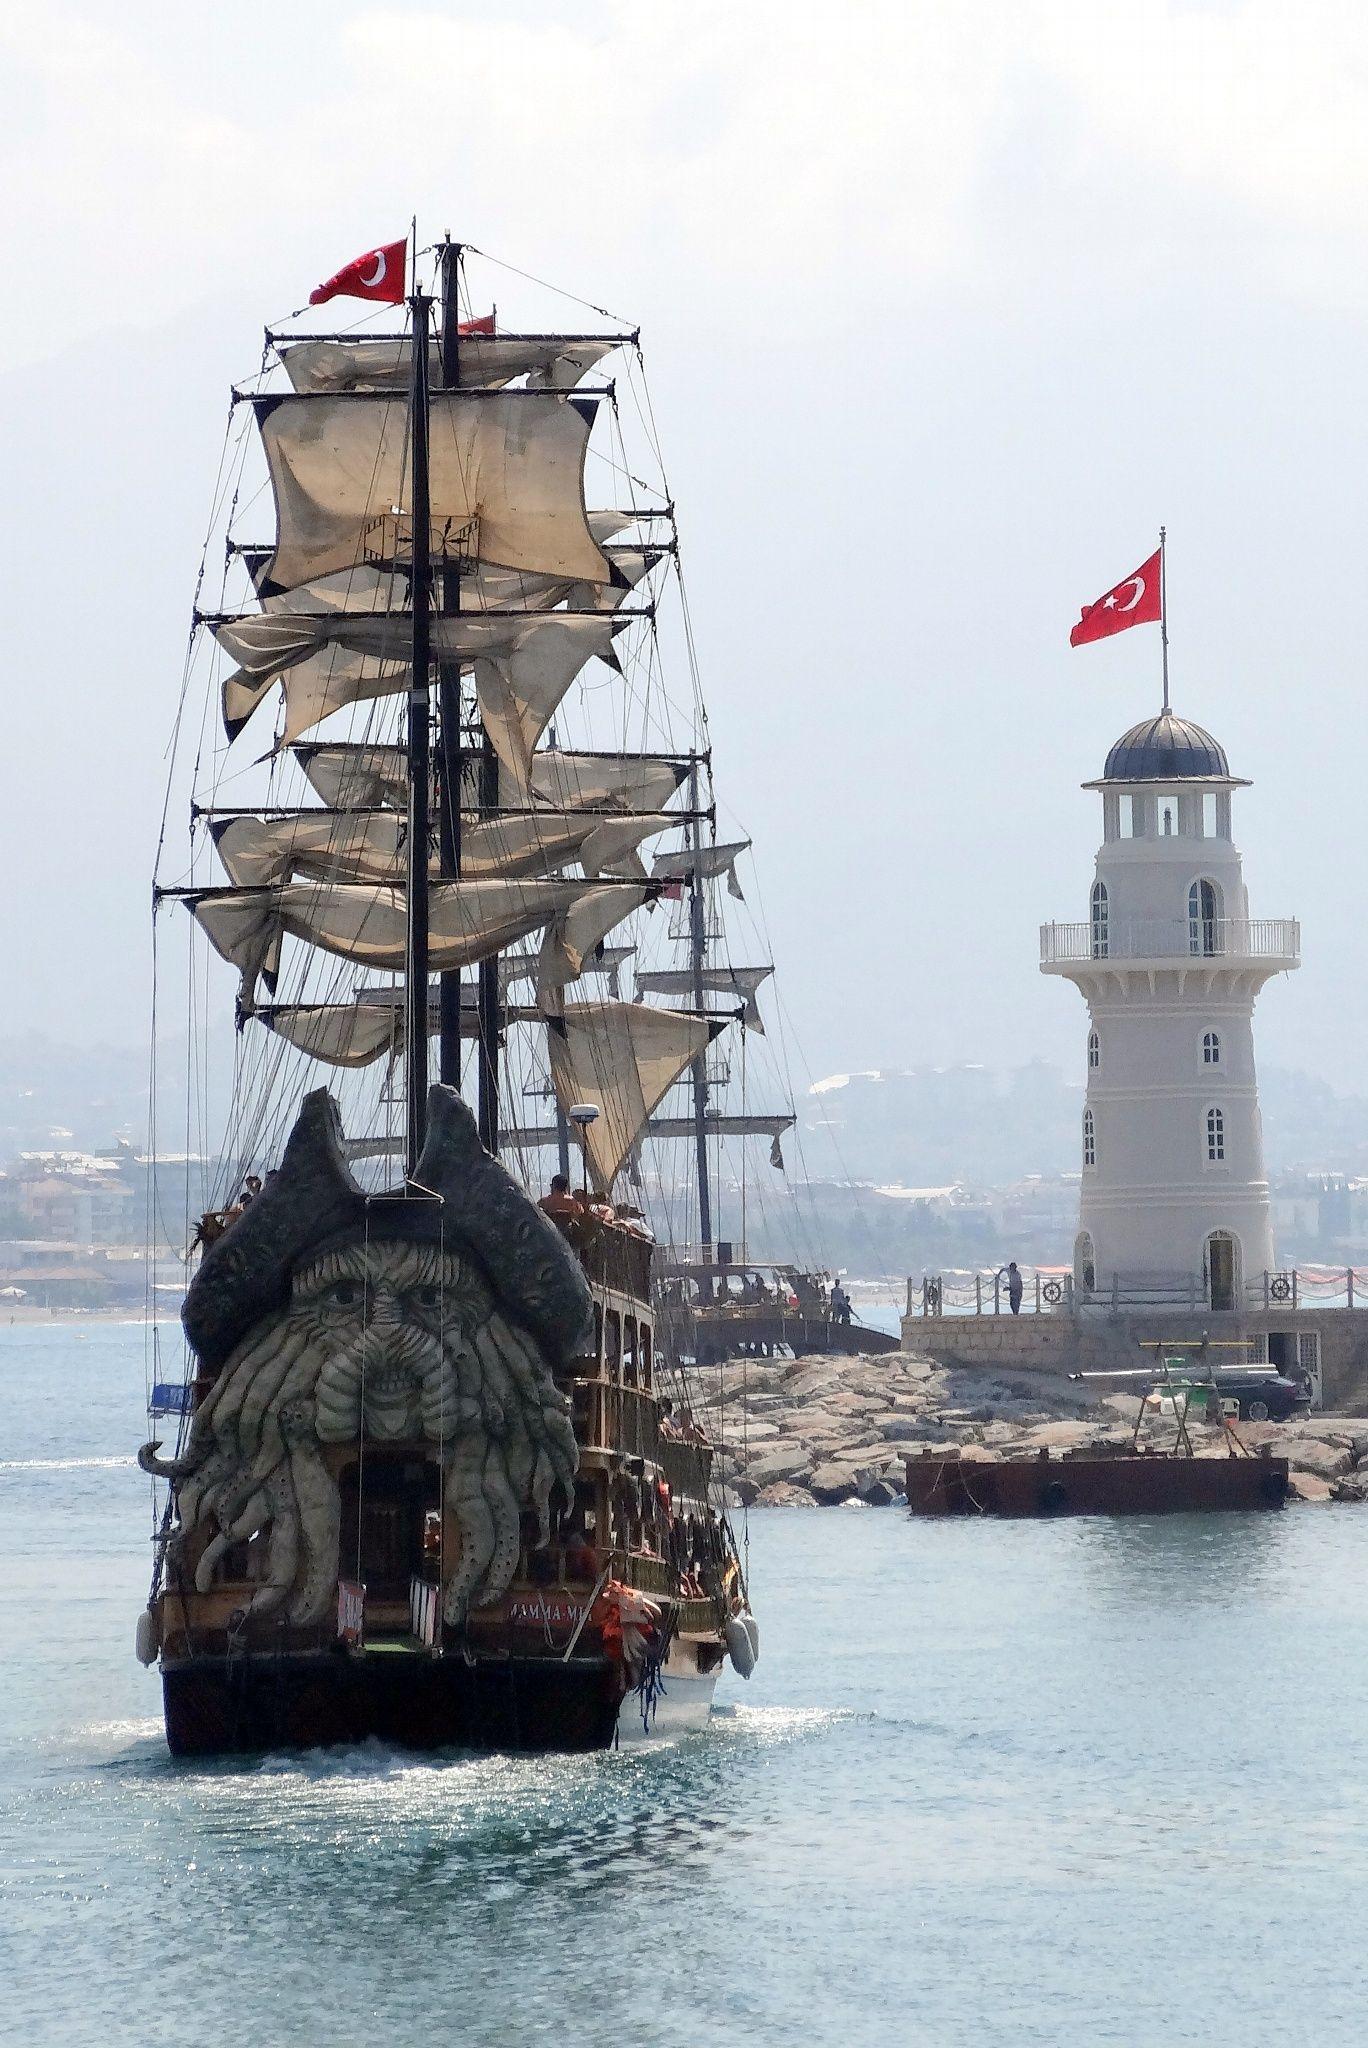 Pirates By Gestur Skarphedinsson Marine World In 2019 Pinterest On Ship Figurehead Viking And Sailing Ships